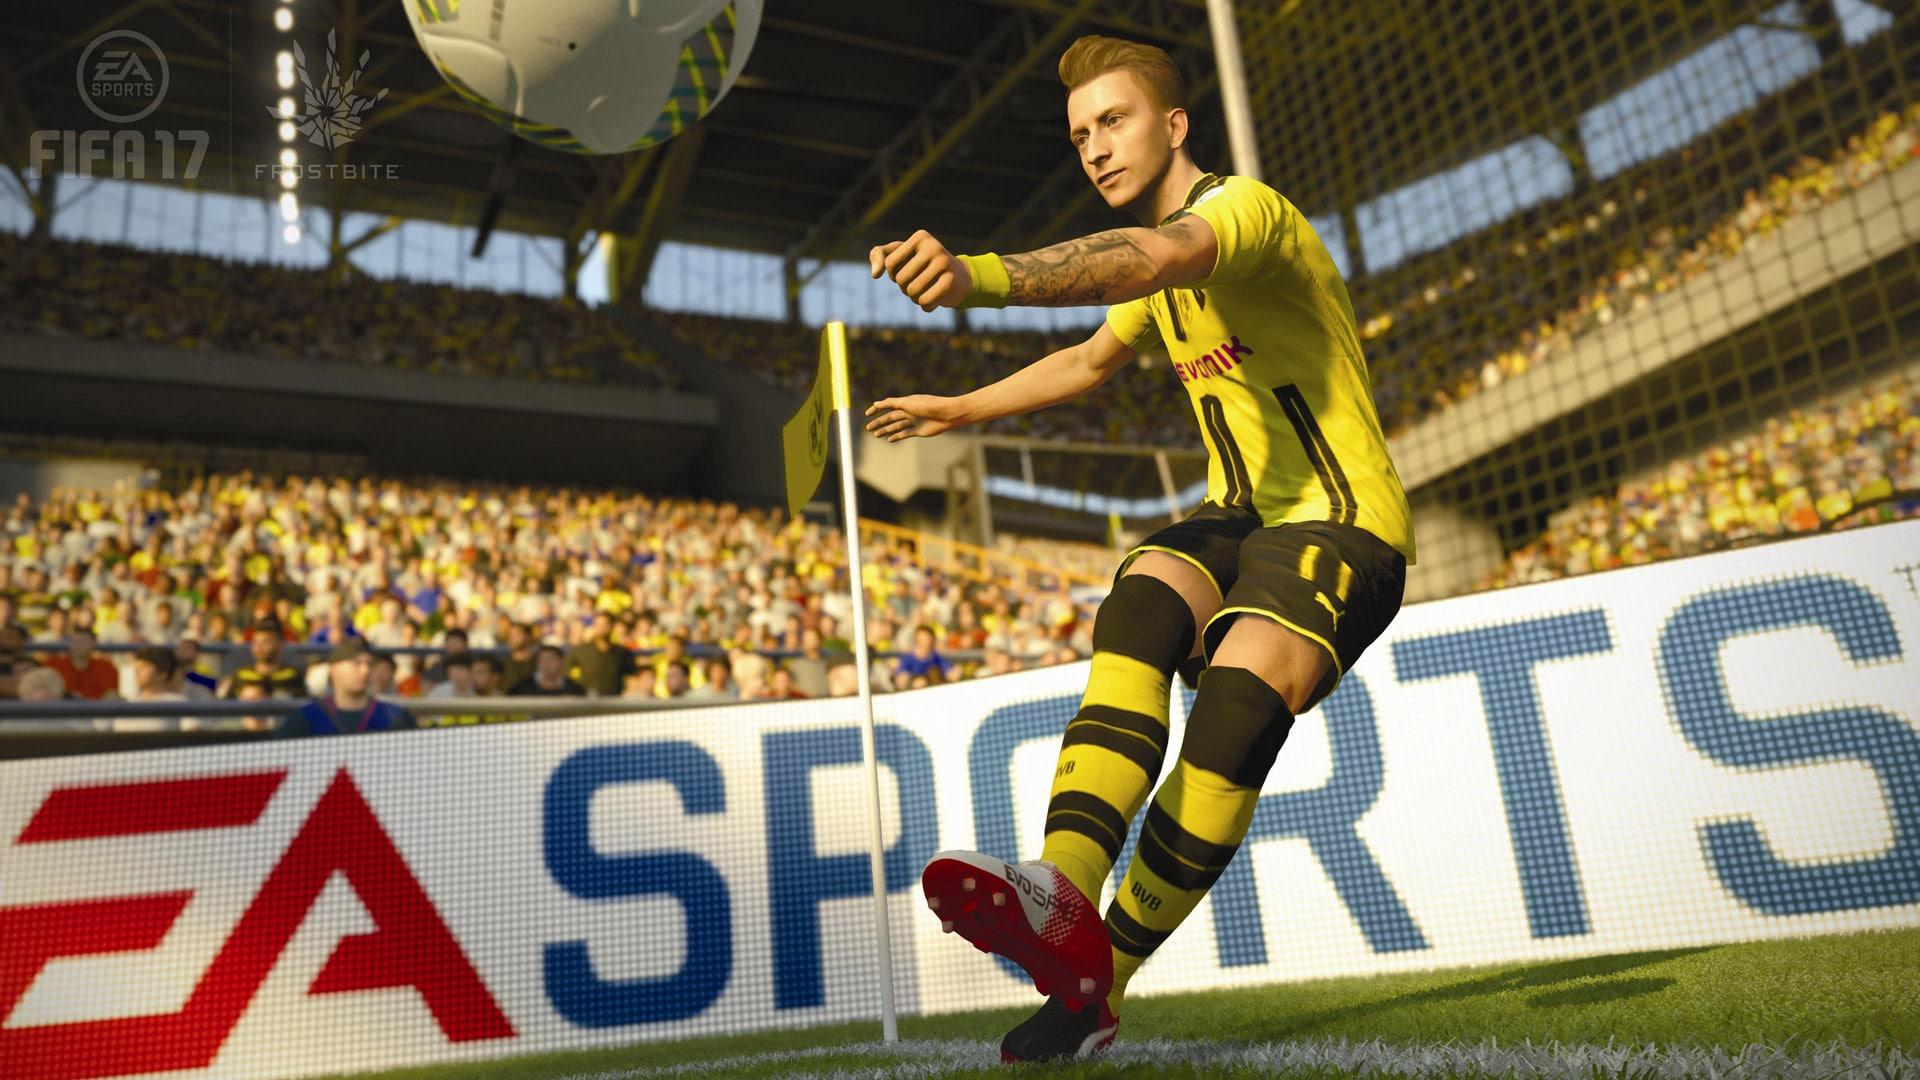 FIFA 17 Free Widescreen